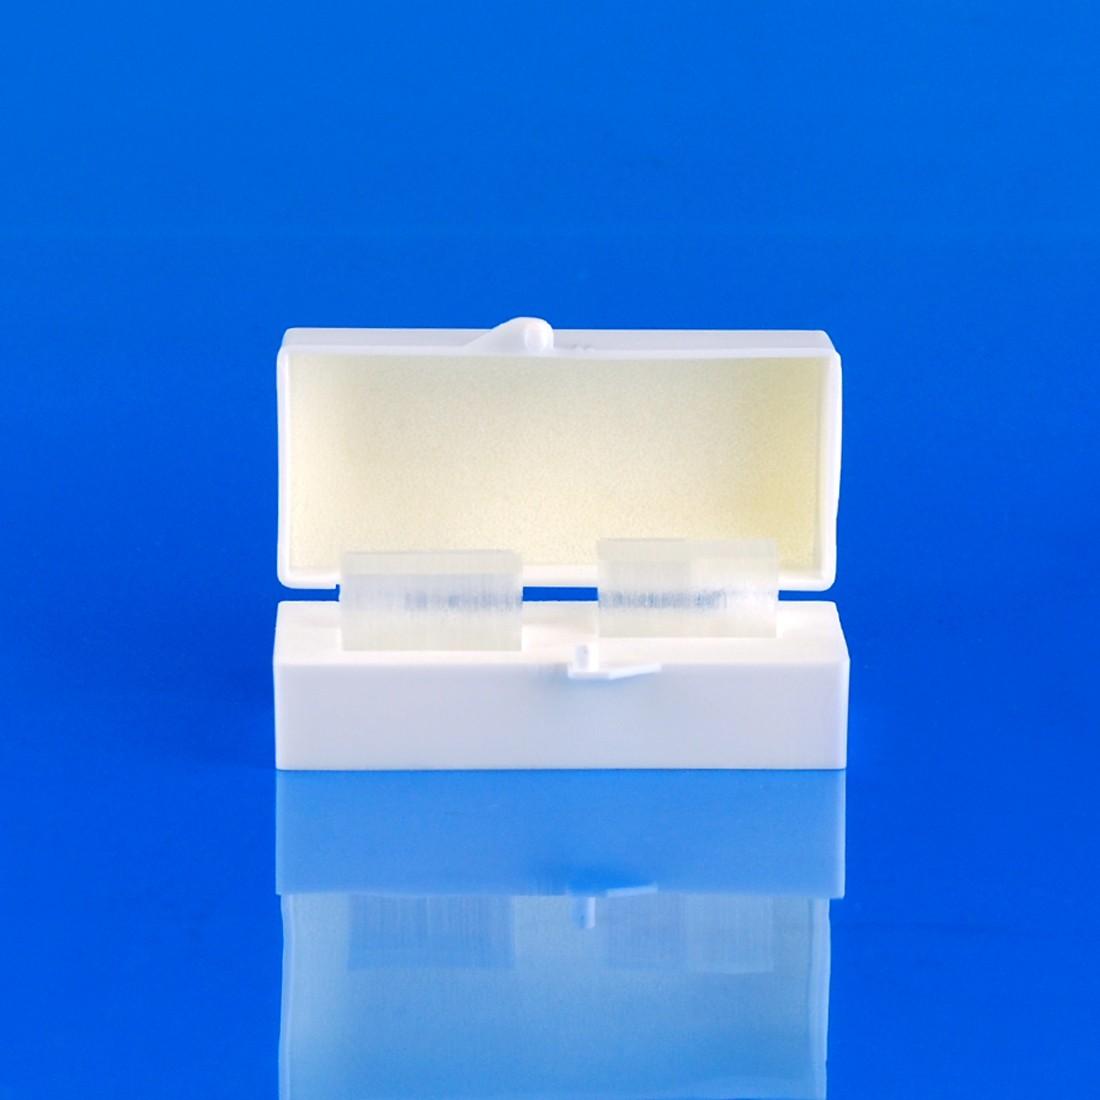 Microscope Slide Coverslips, Glass, 22mm x 22mm